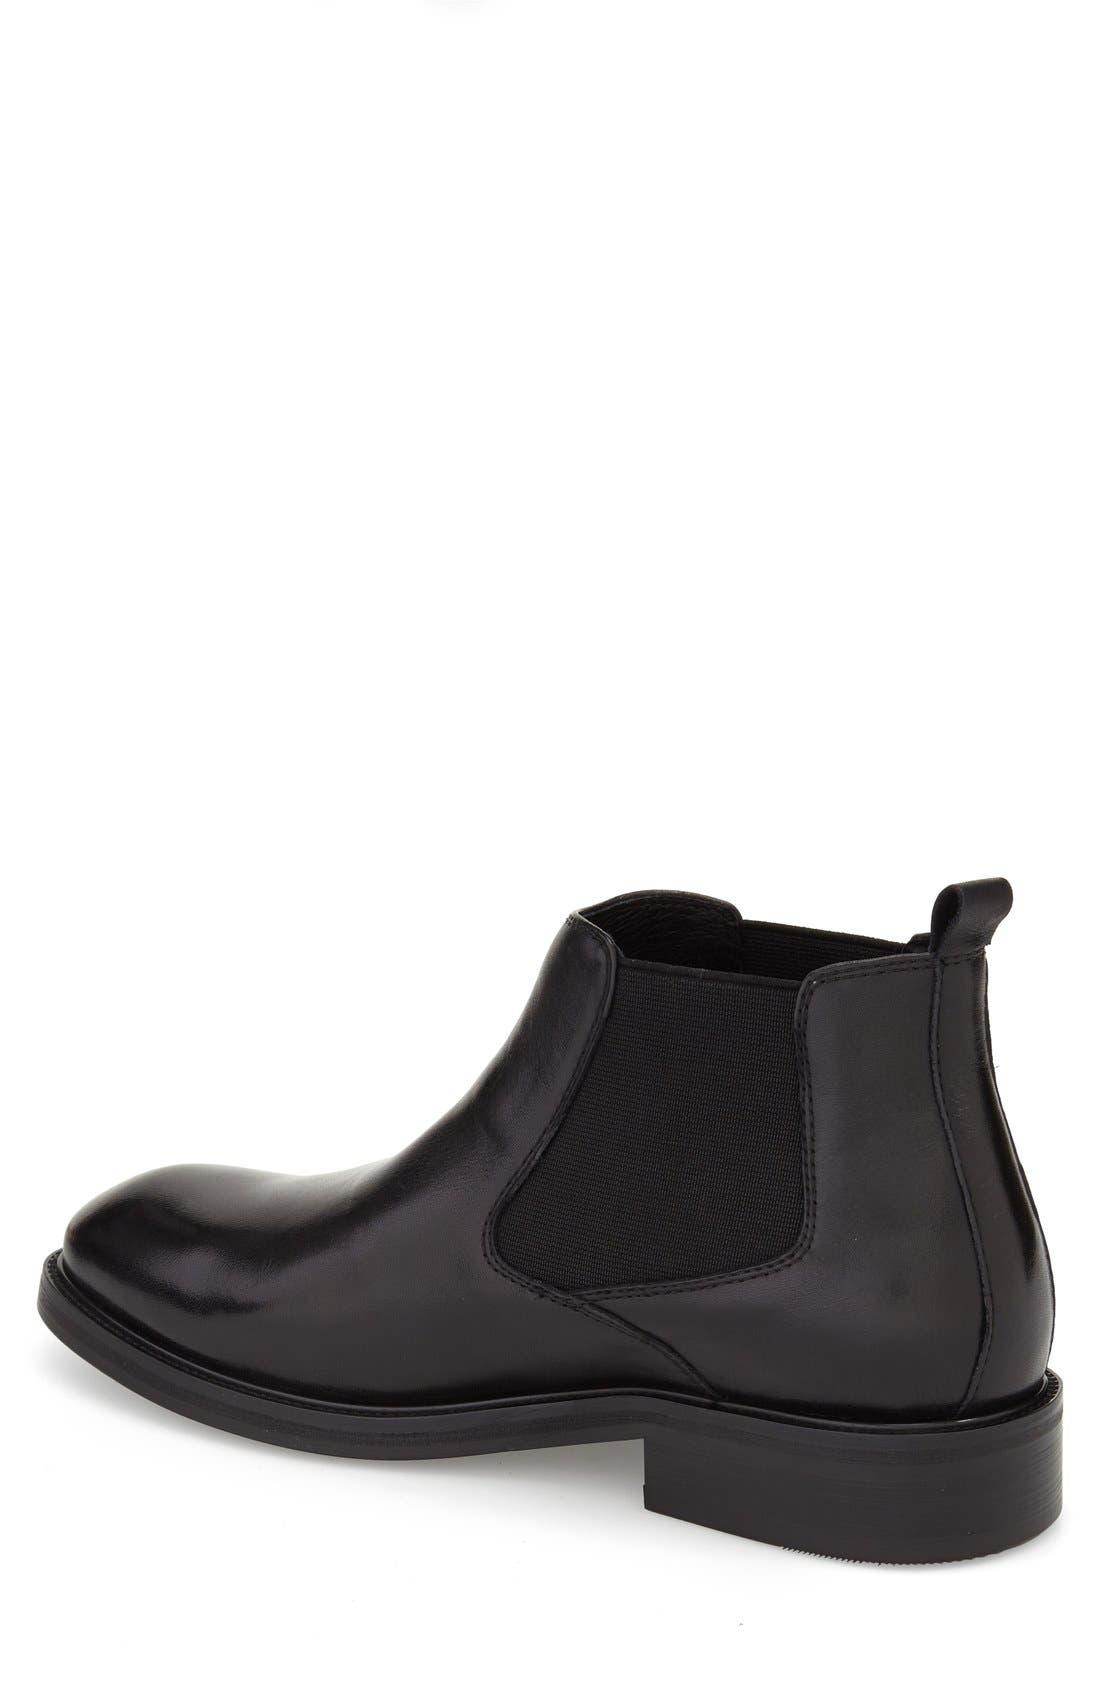 'Napoli' Double Monk Strap Shoe,                             Alternate thumbnail 2, color,                             Black